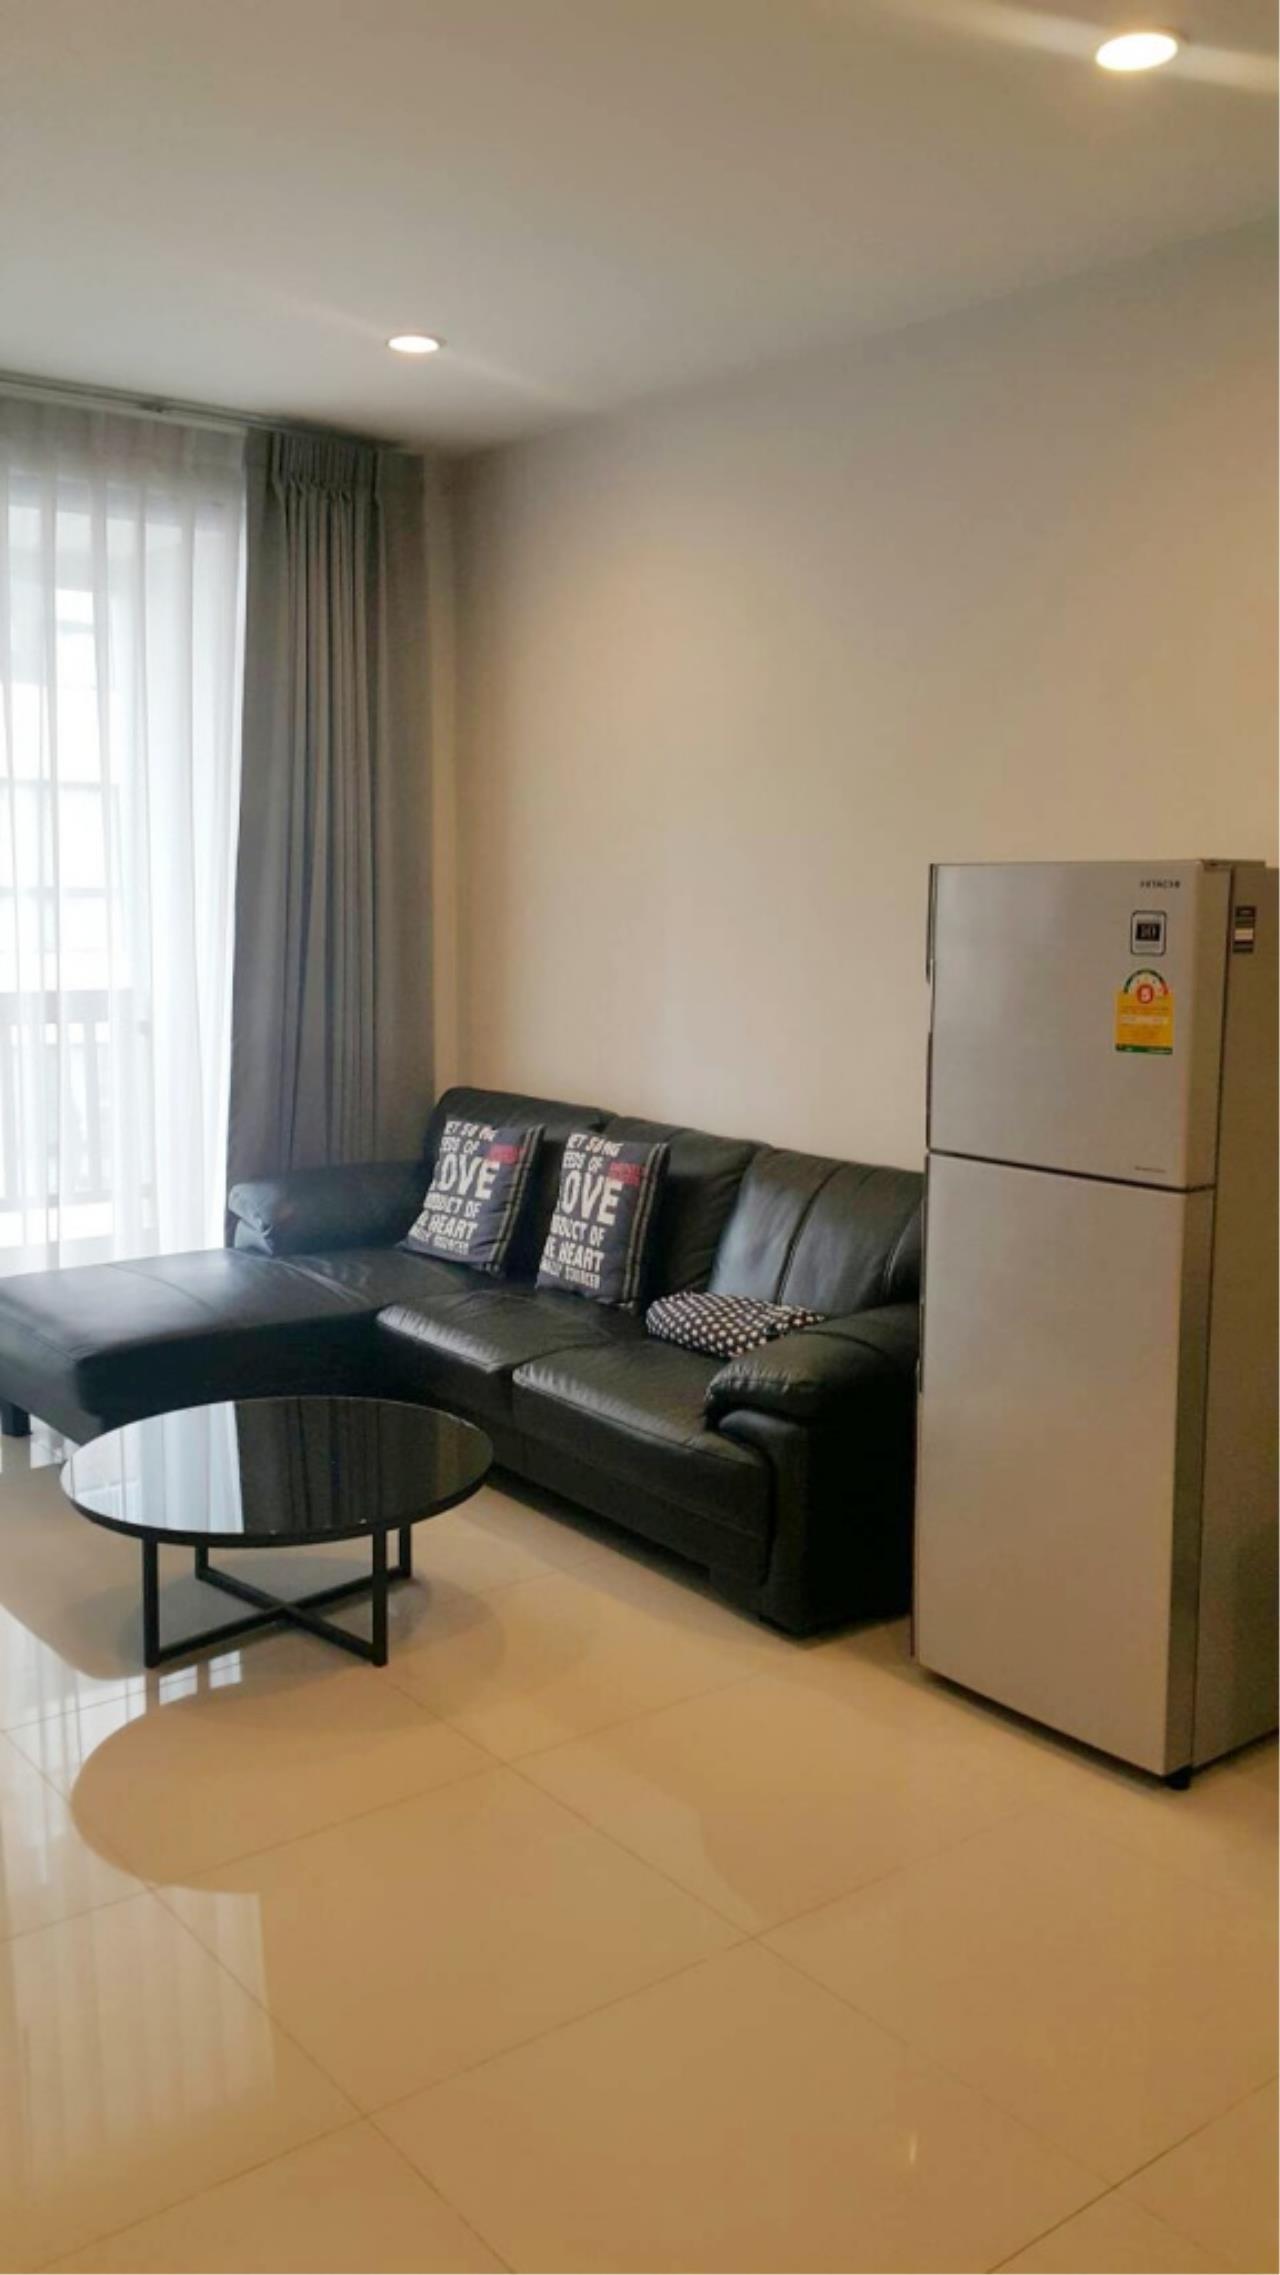 Century21 Skylux Agency's Vista Garden / Condo For Rent / 1 Bedroom / 44.92 SQM / BTS Phra Khanong / Bangkok 1